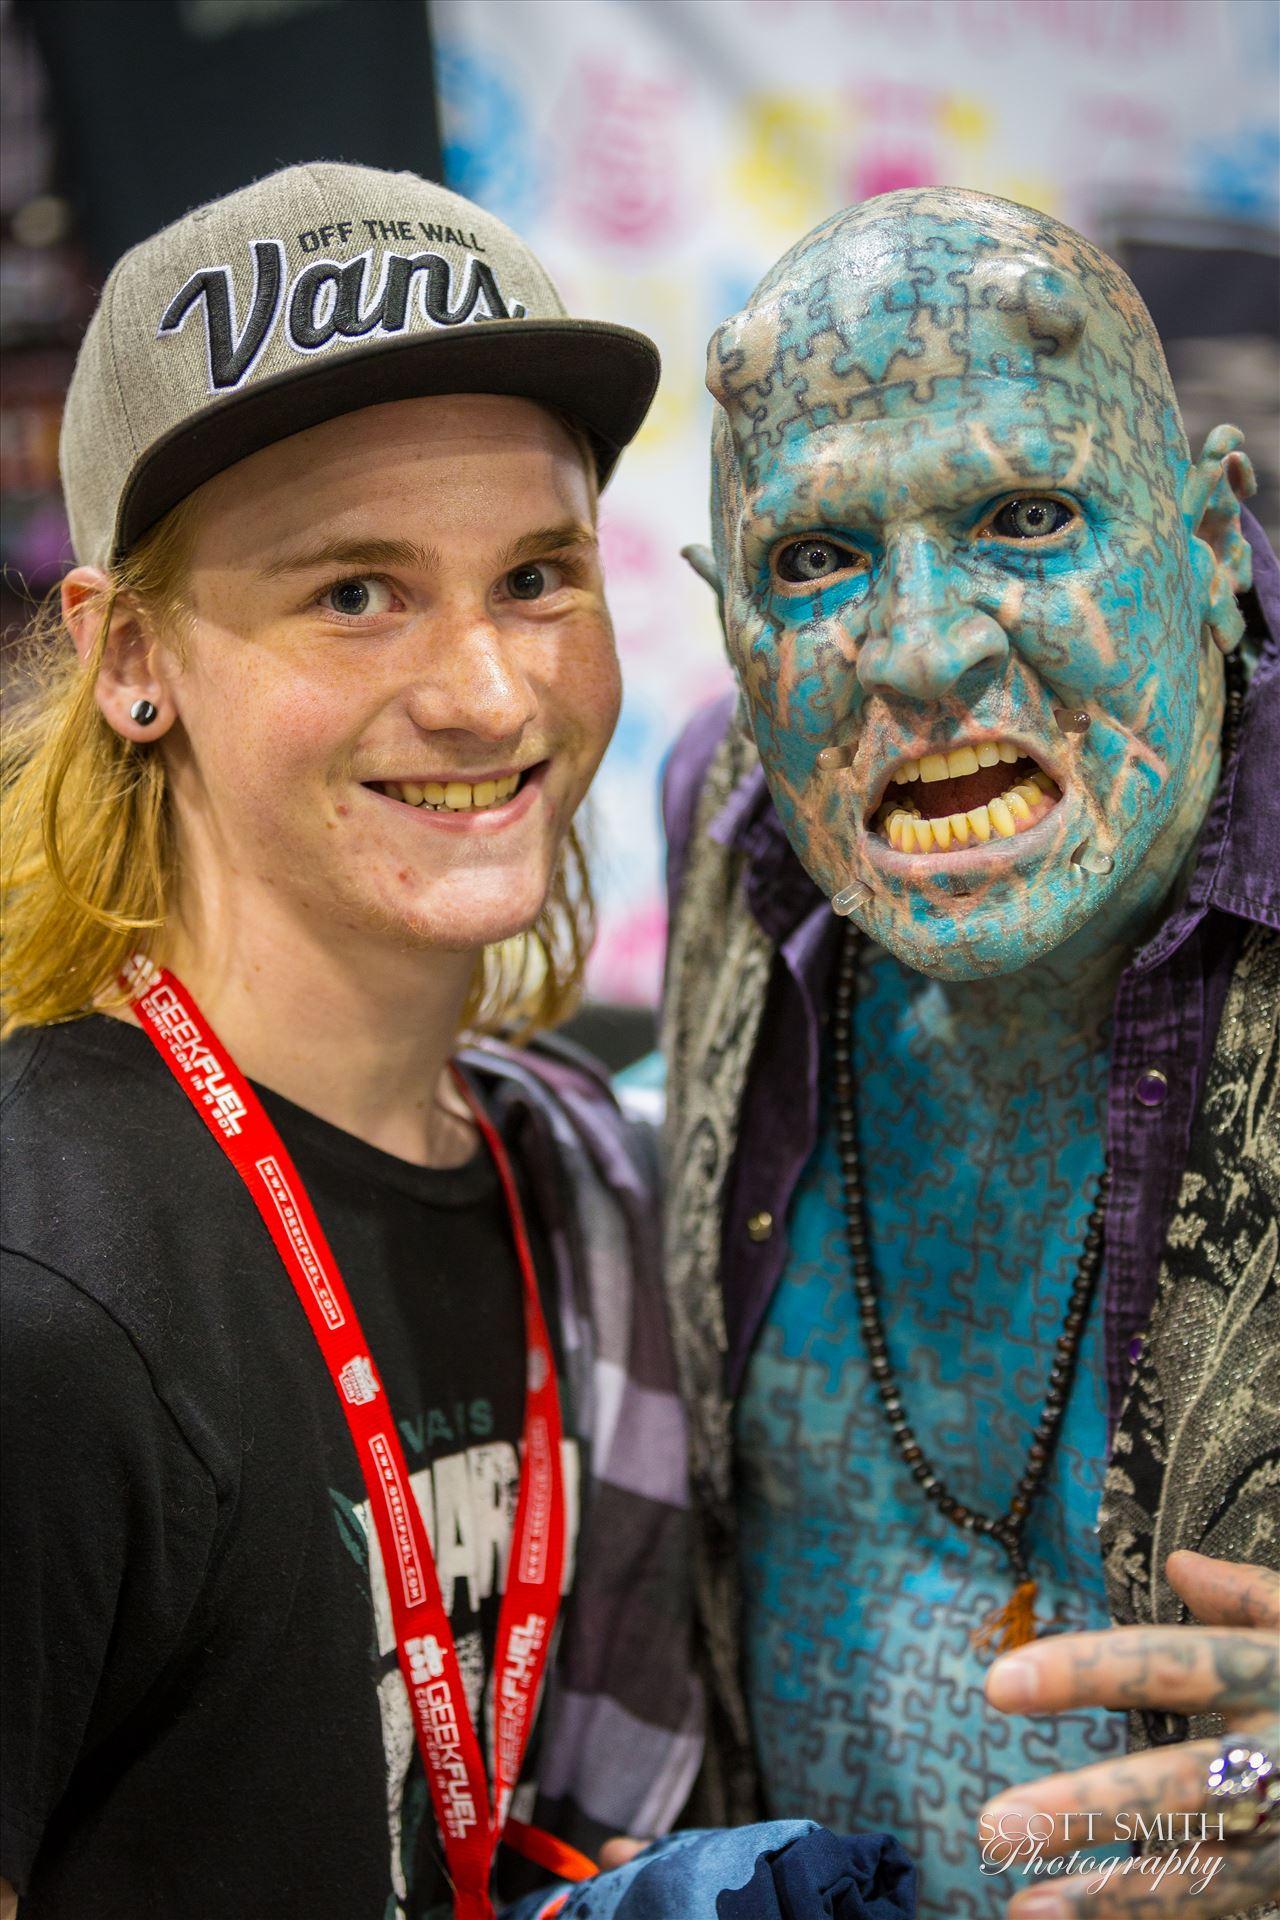 Denver Comic Con 2016 31 - Denver Comic Con 2016 at the Colorado Convention Center. The Enigma with my son. by D Scott Smith